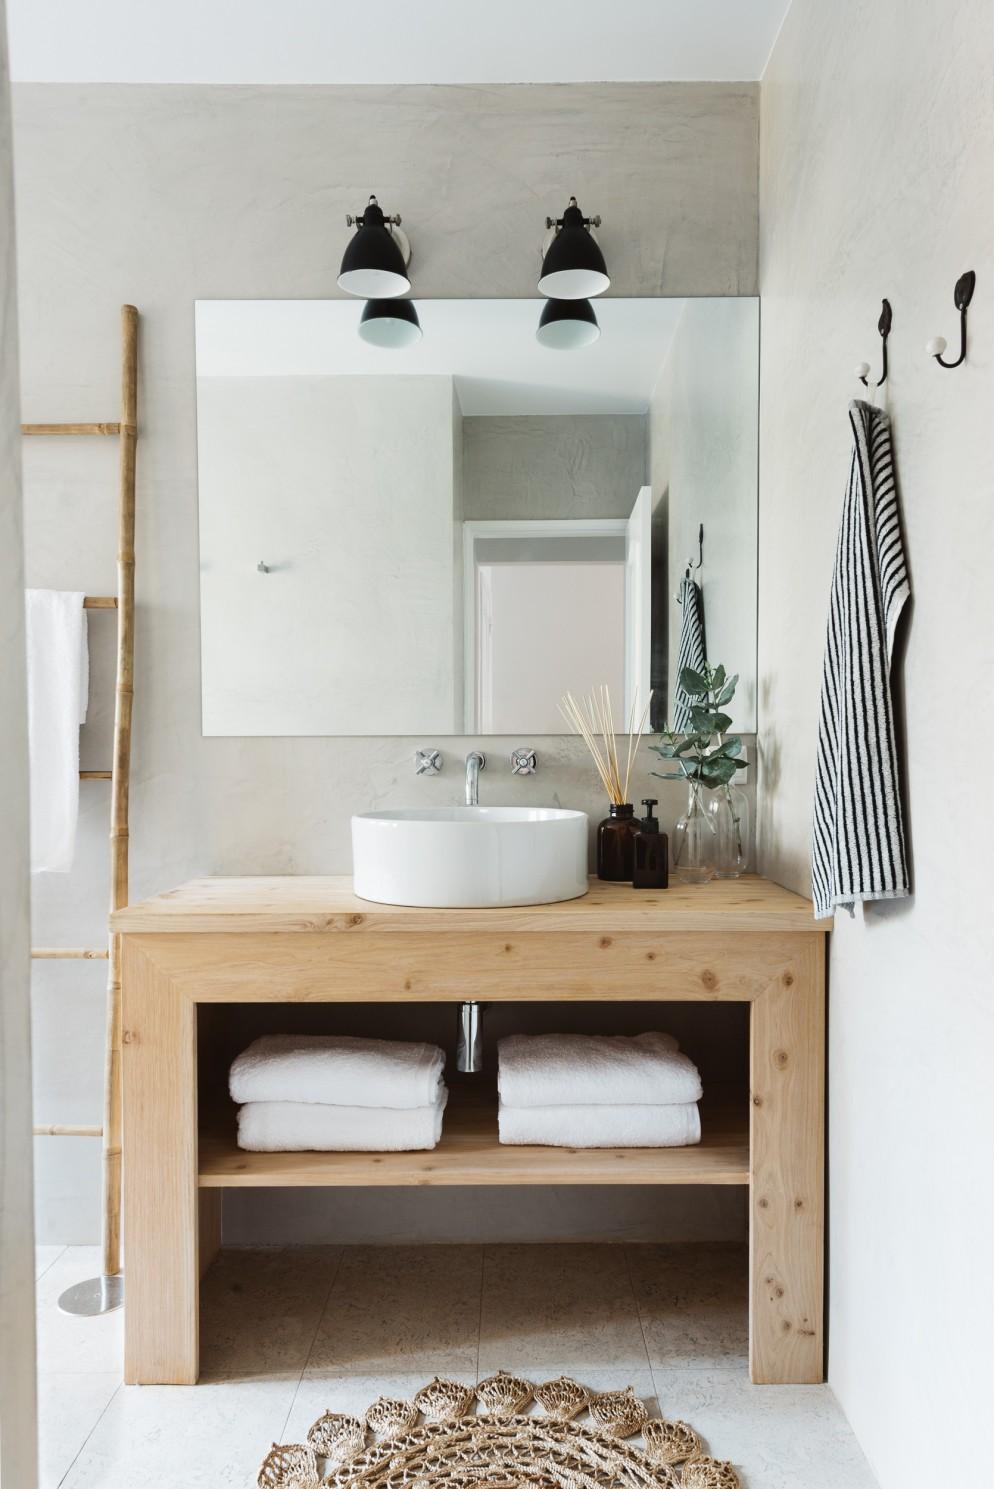 arredare-stile-nordico-lisbona-arkstudio-living-corriere-2